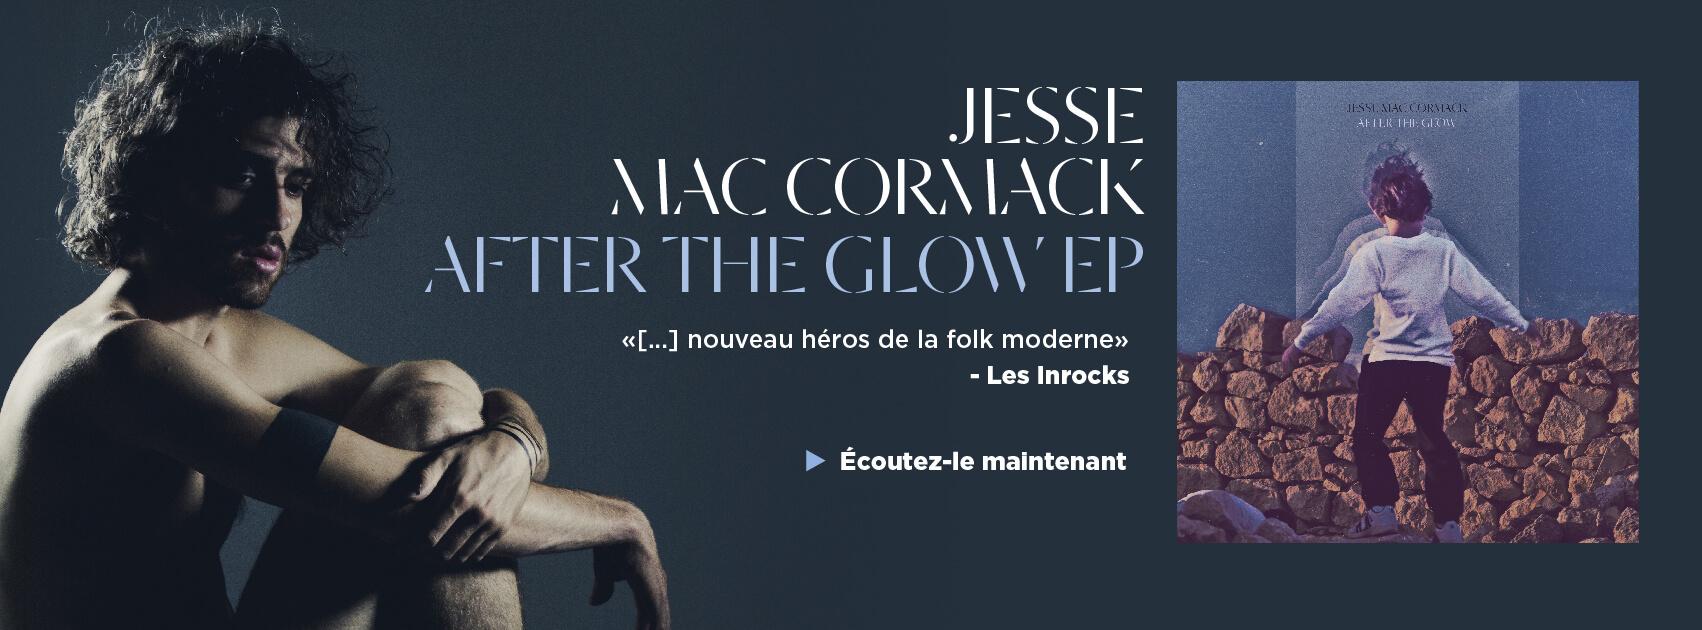 jessemaccormack-fr-01